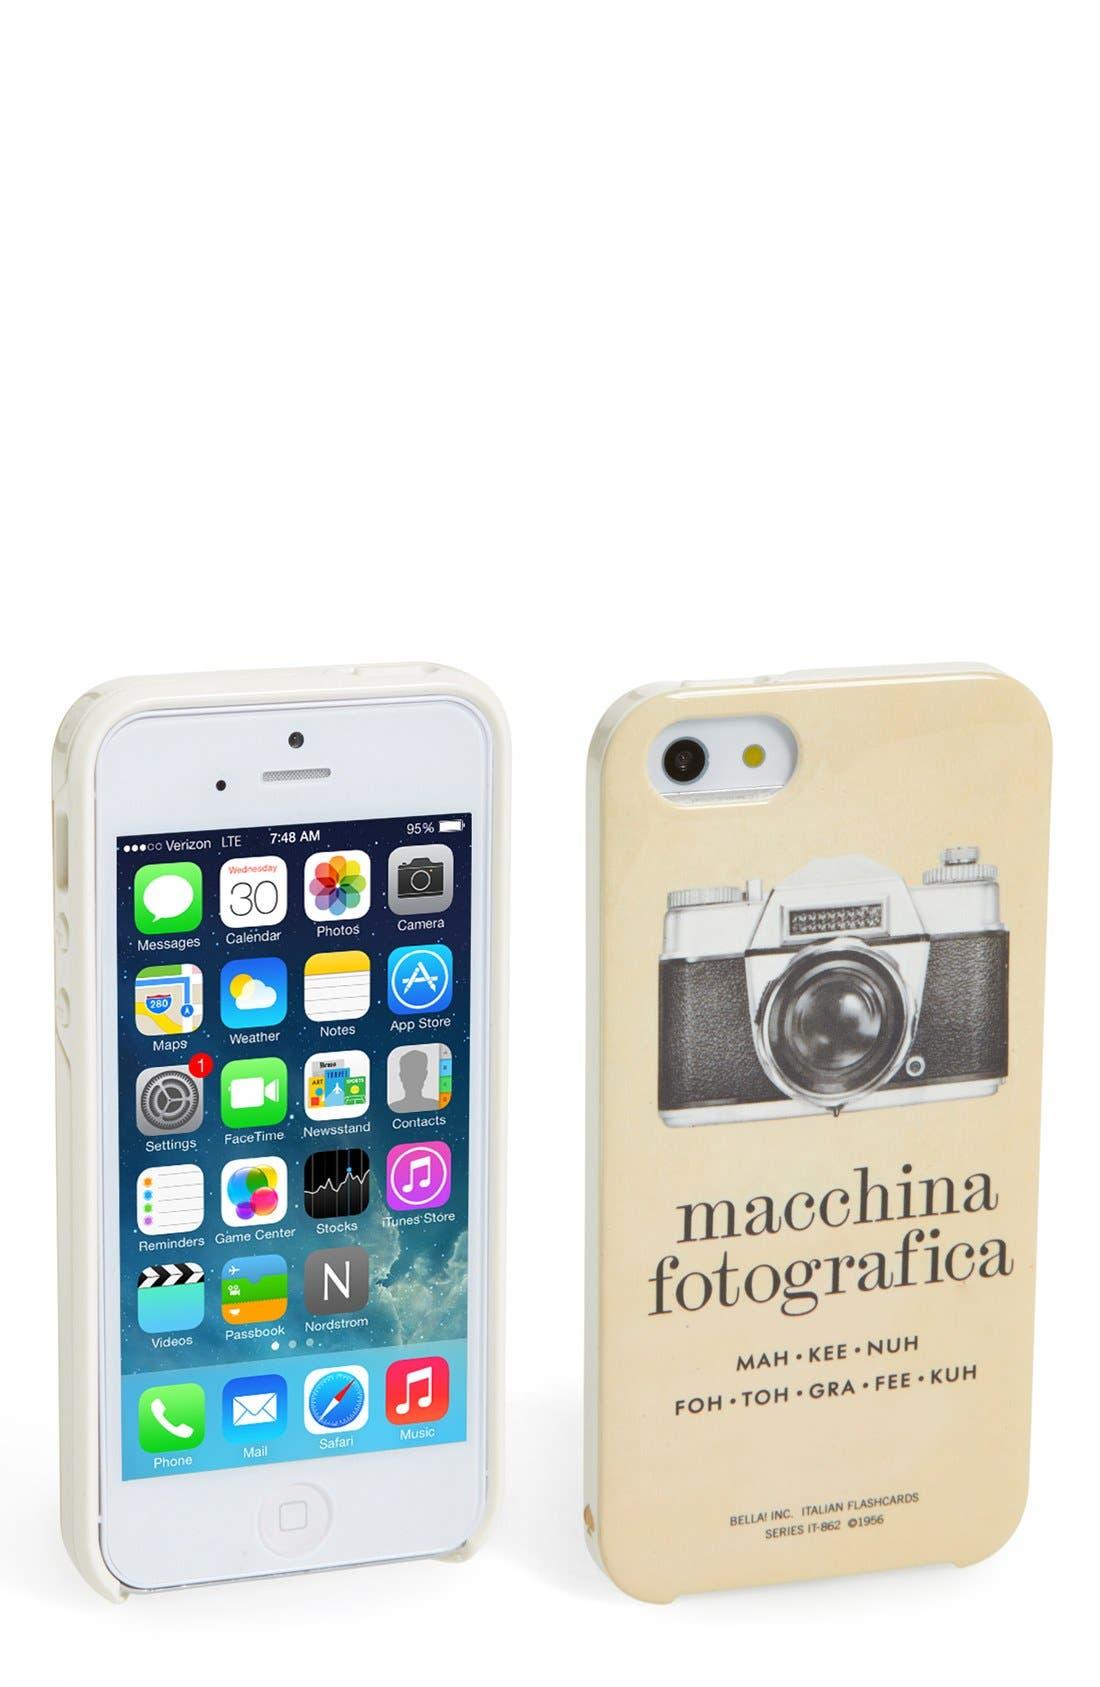 Alternate Image 1 Selected - kate spade new york 'italian flashcards' iPhone 5 & 5s case